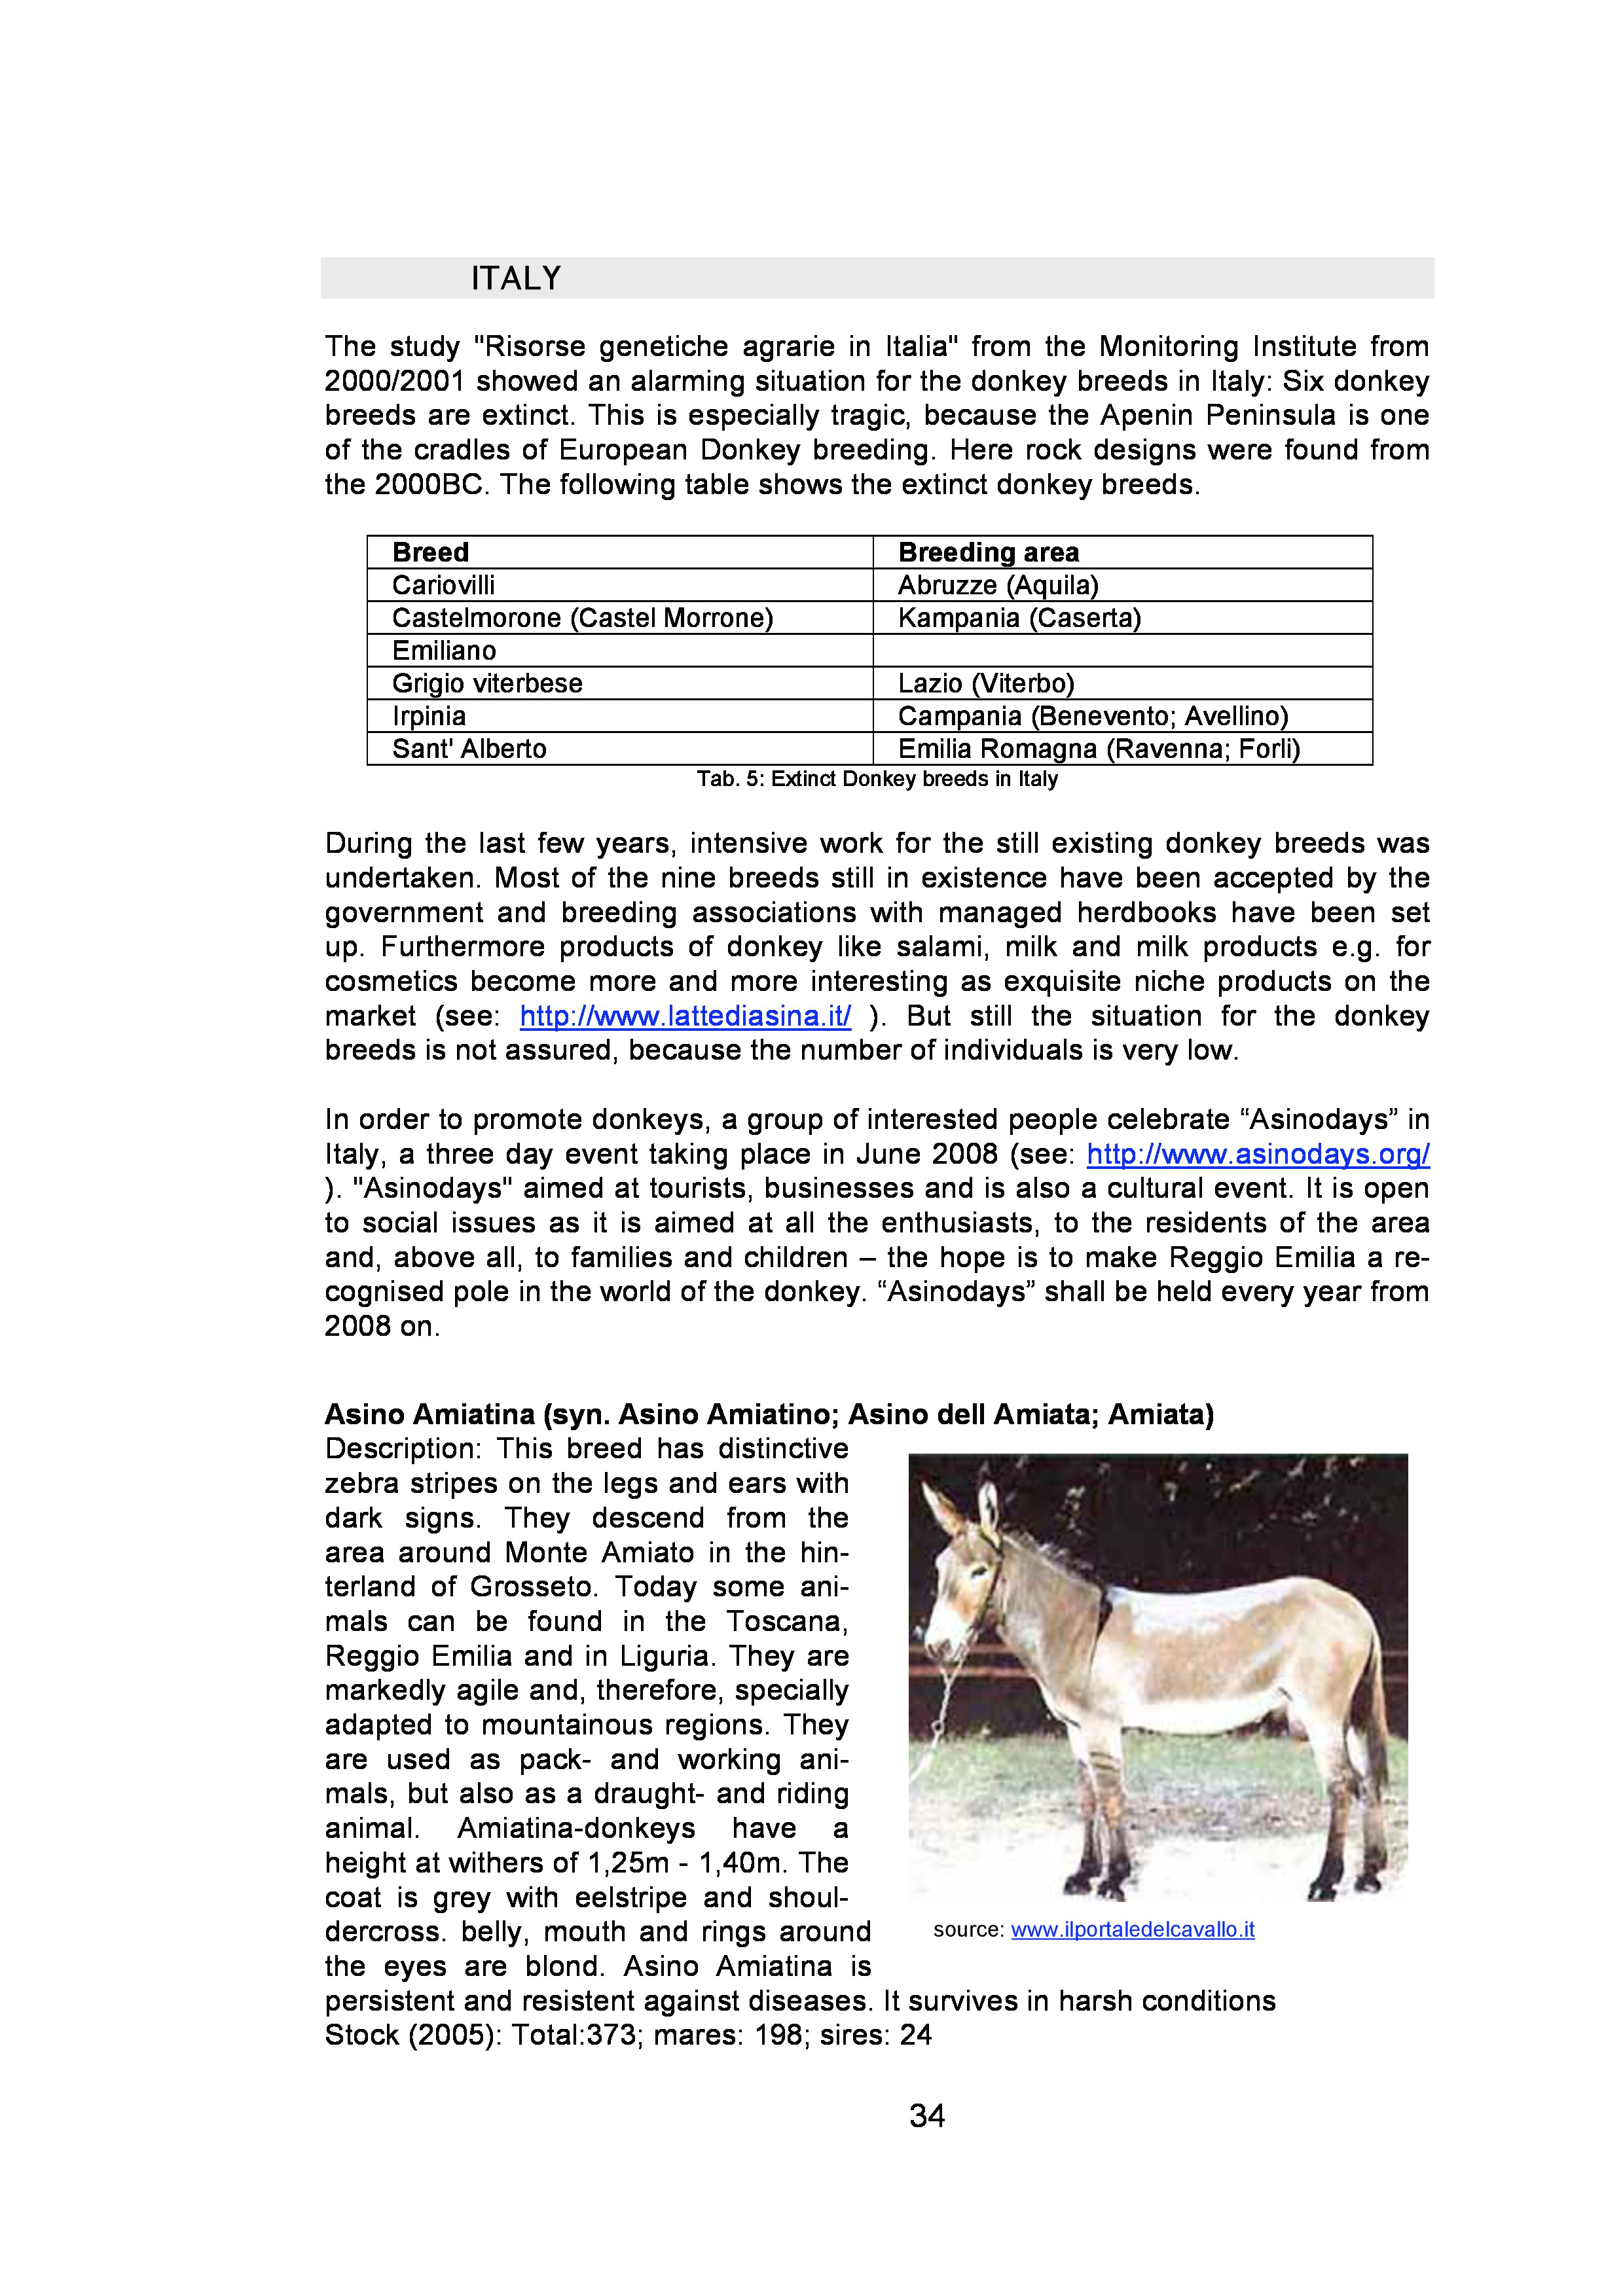 page-33.jpg